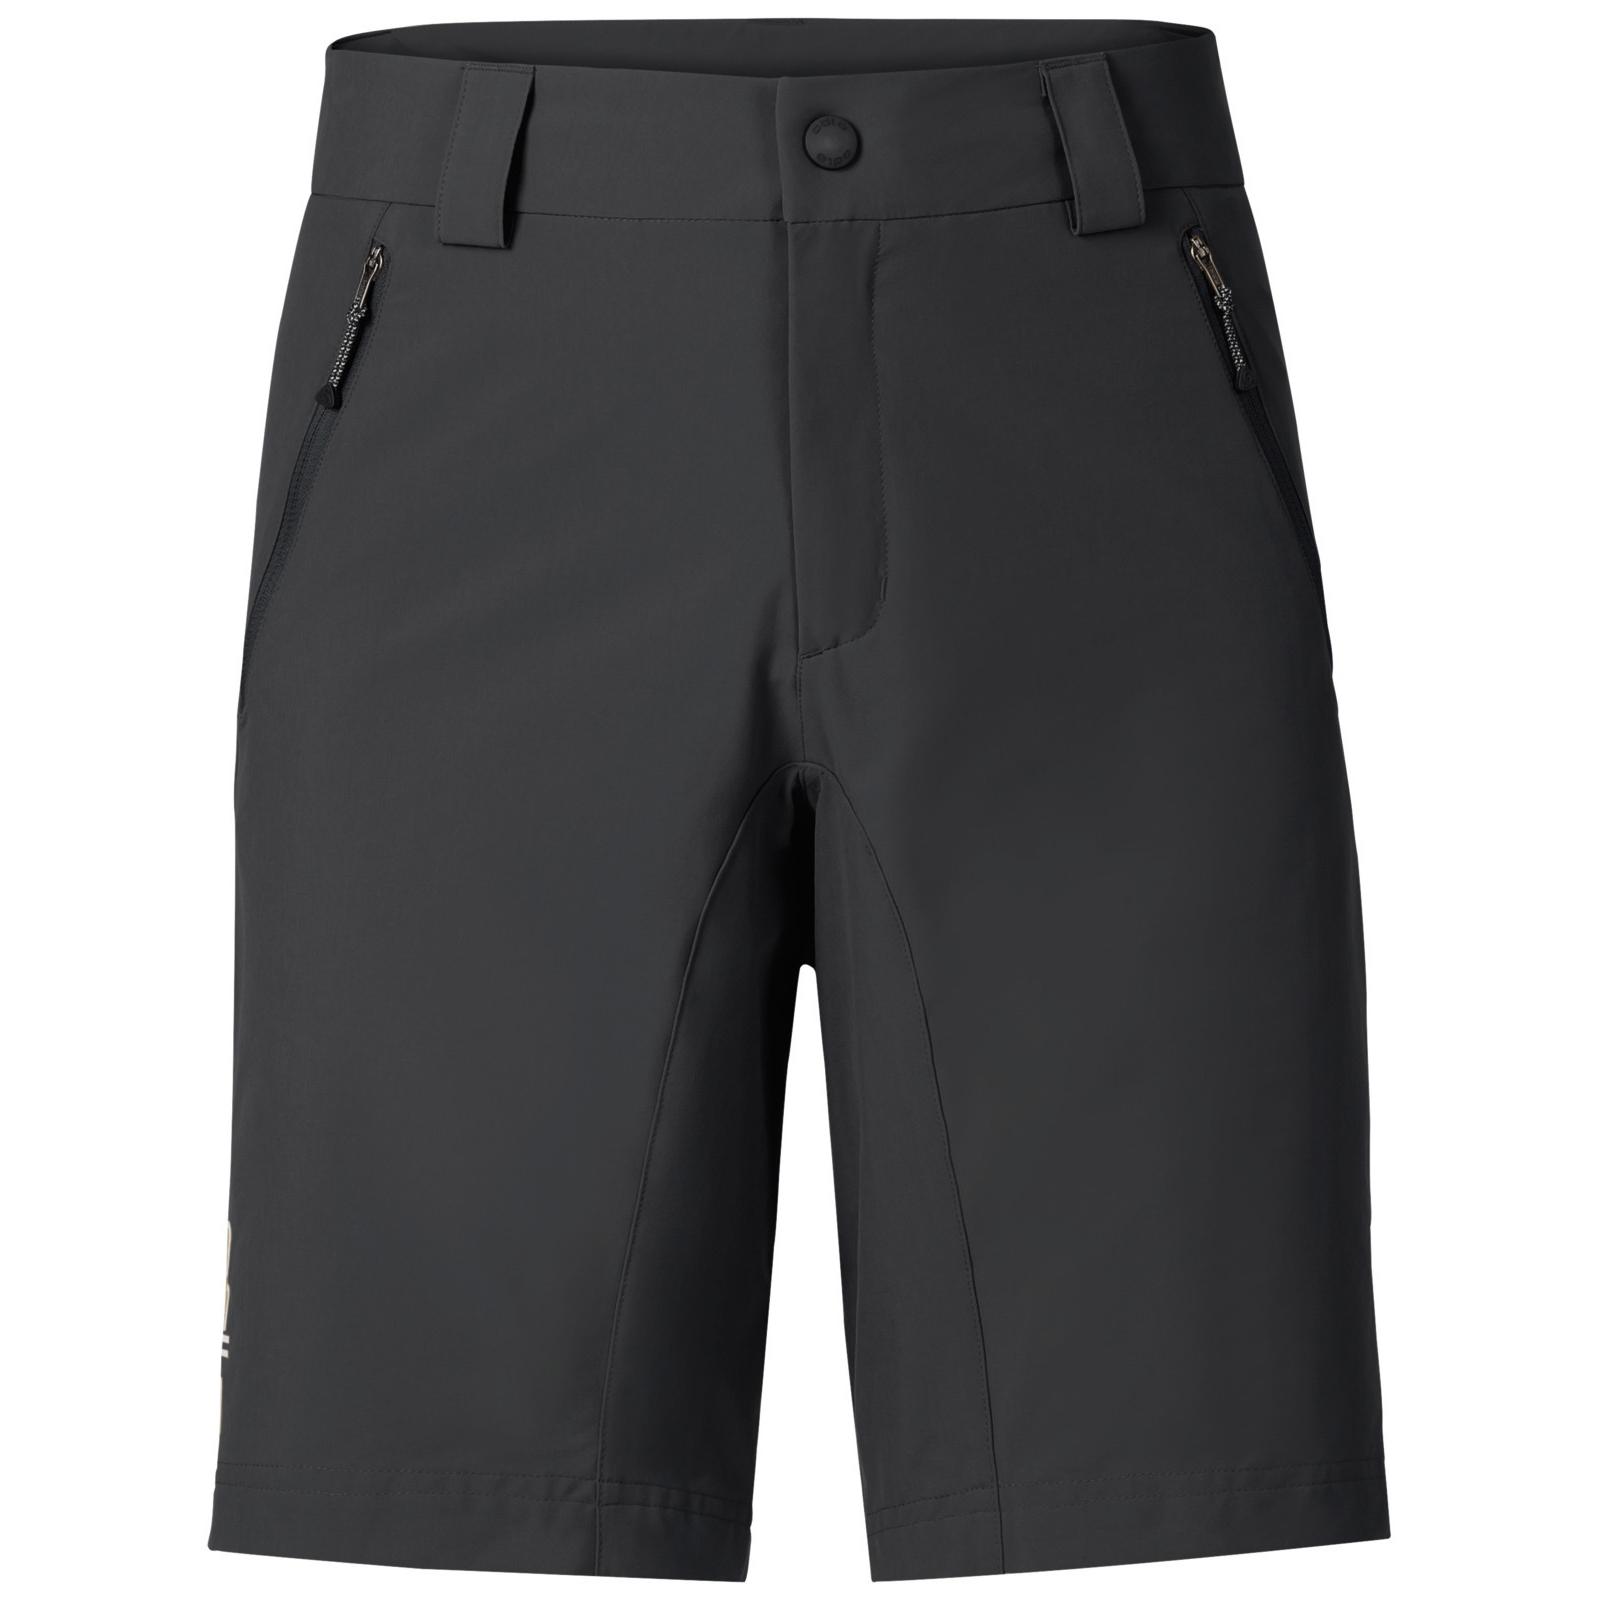 Odlo Spoor Shorts | Graphite Grey